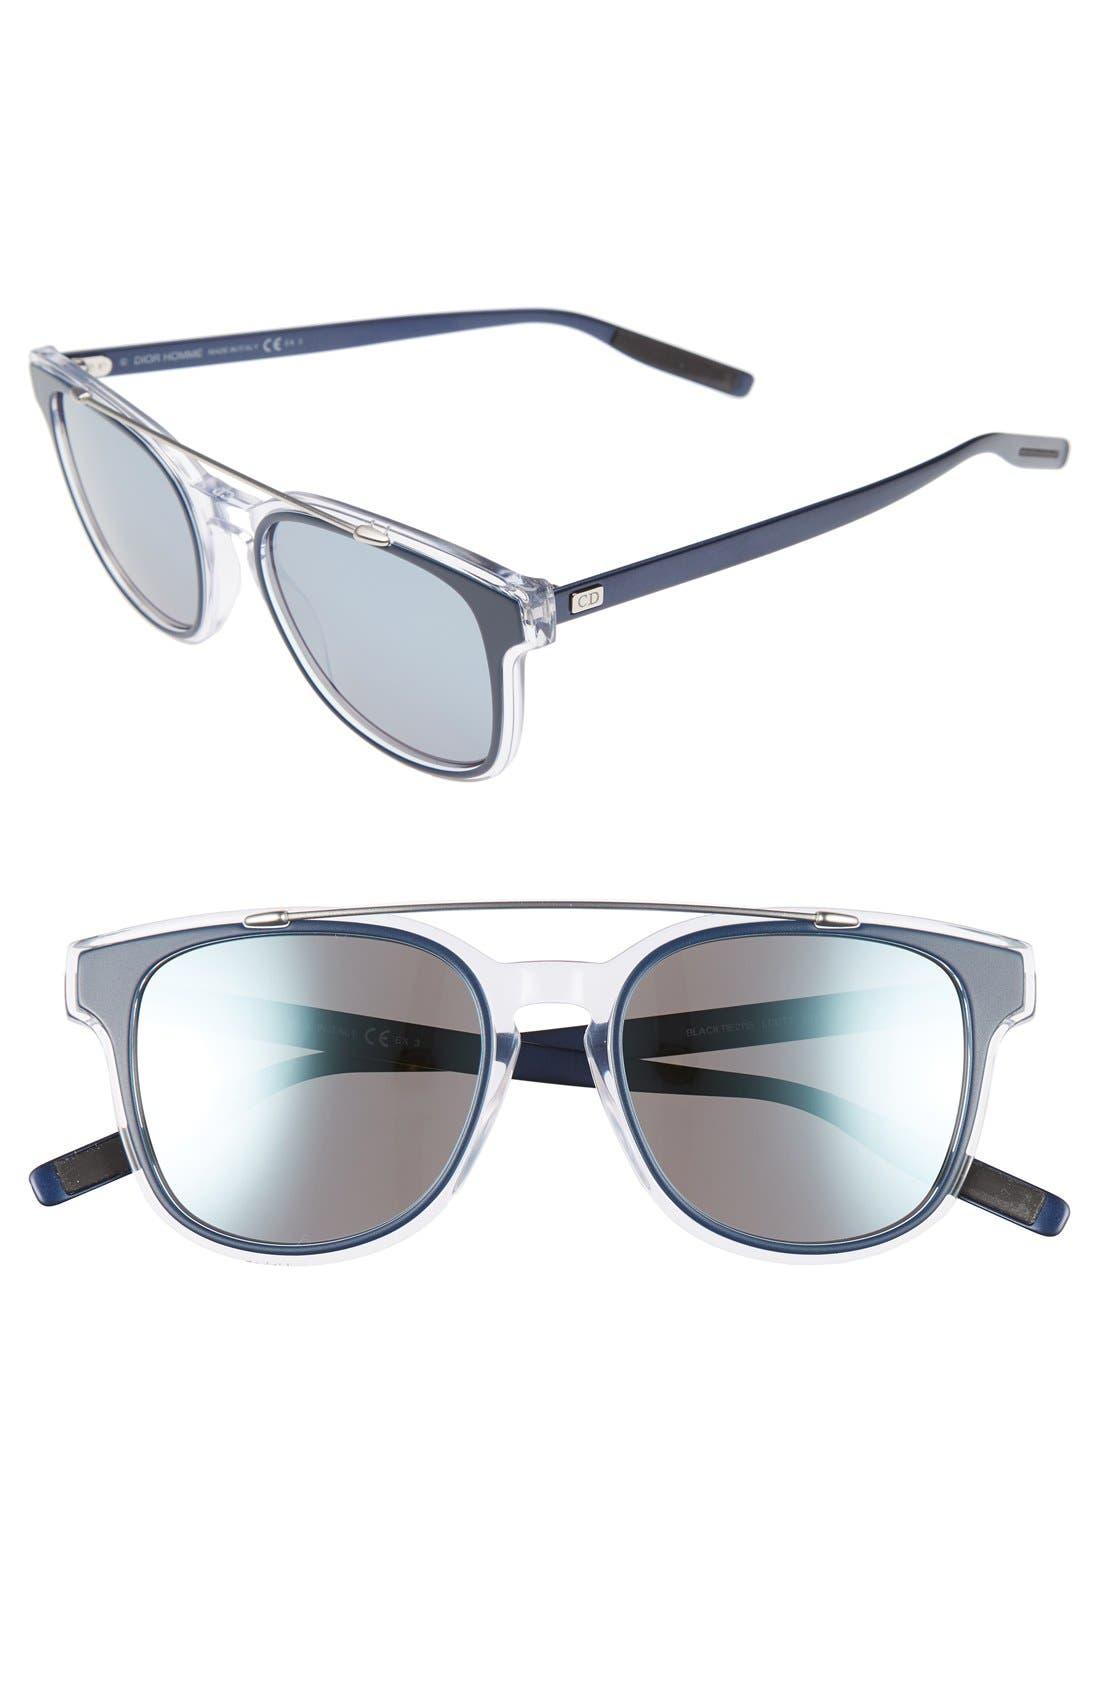 'Black Tie' 52mm Sunglasses,                             Main thumbnail 1, color,                             BLUE CRYSTAL PALLADIUM